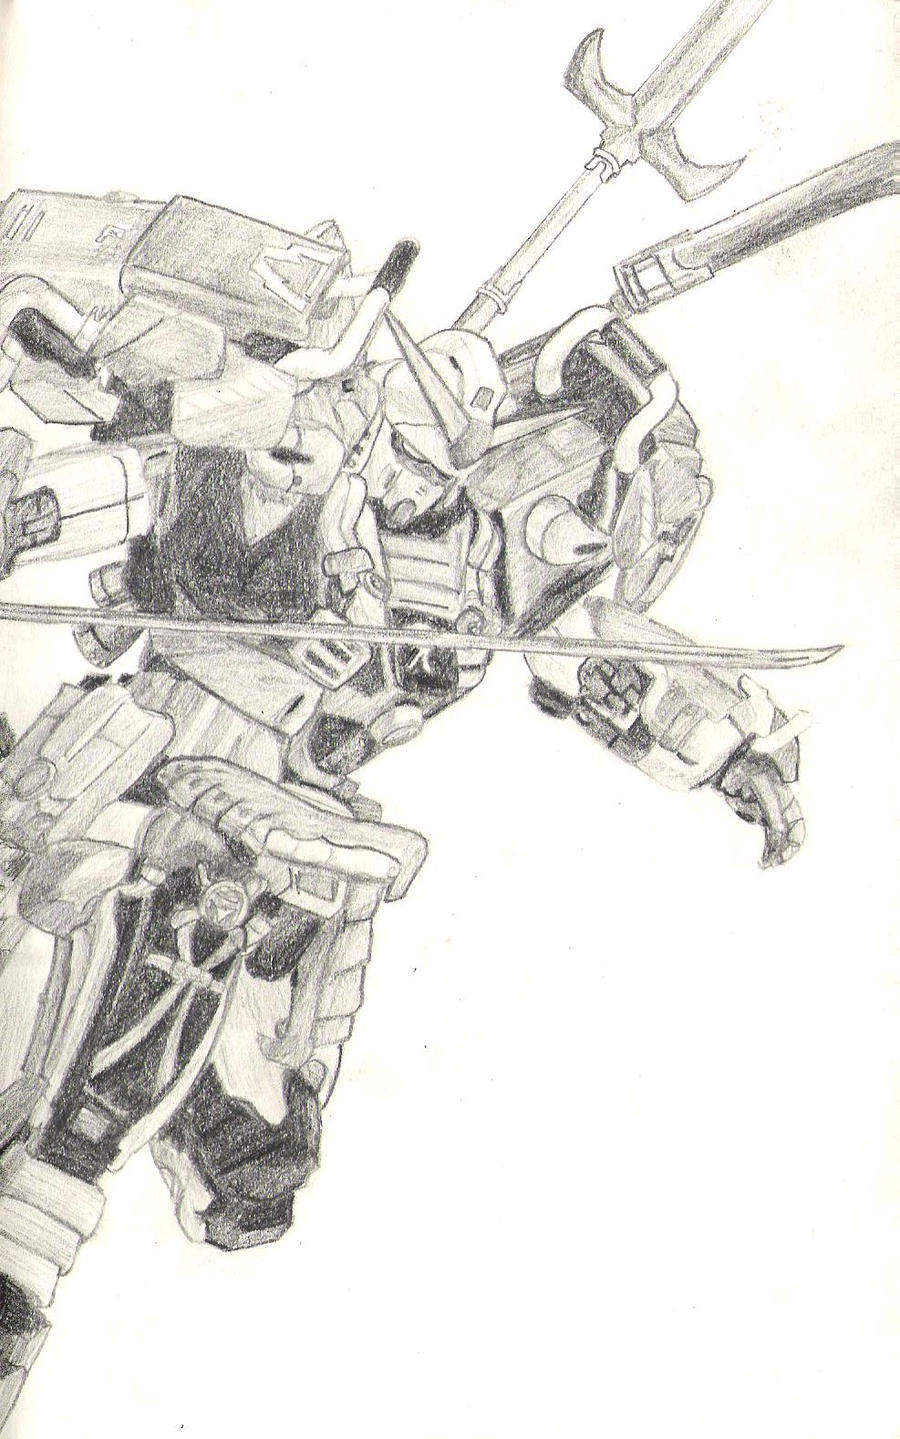 Shin Musha Gundam by 130Dk